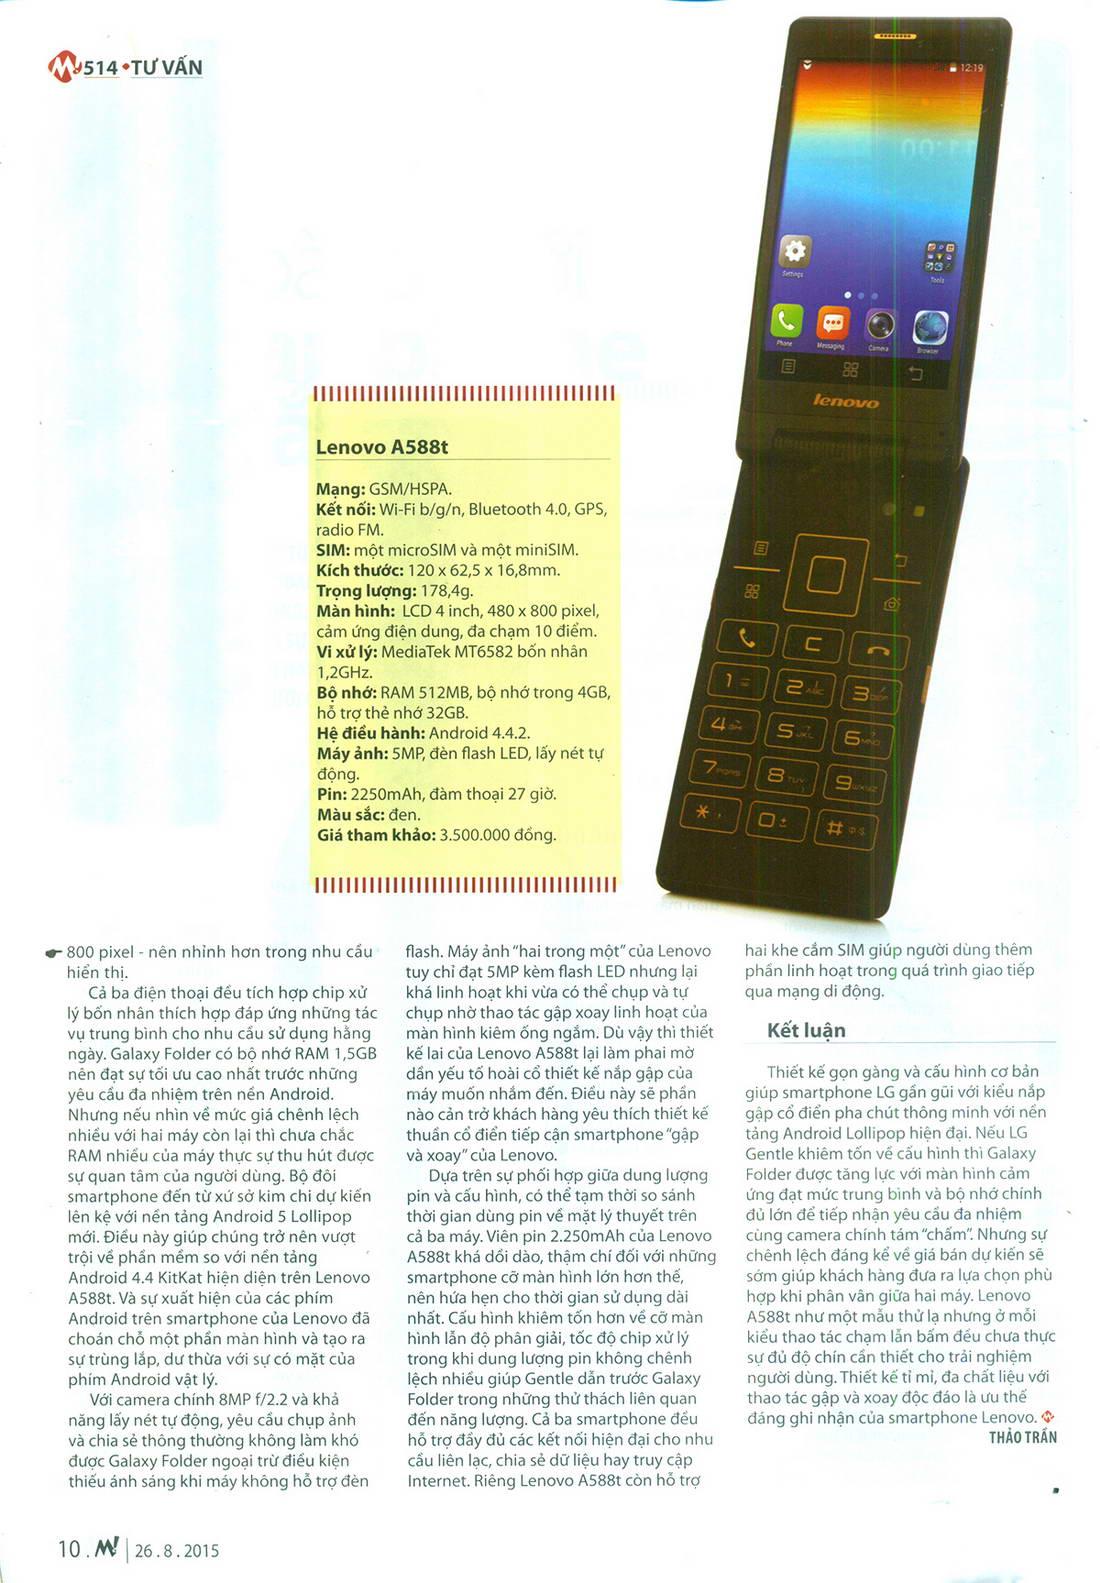 EChip Mobile  514 - tapchicntt.com